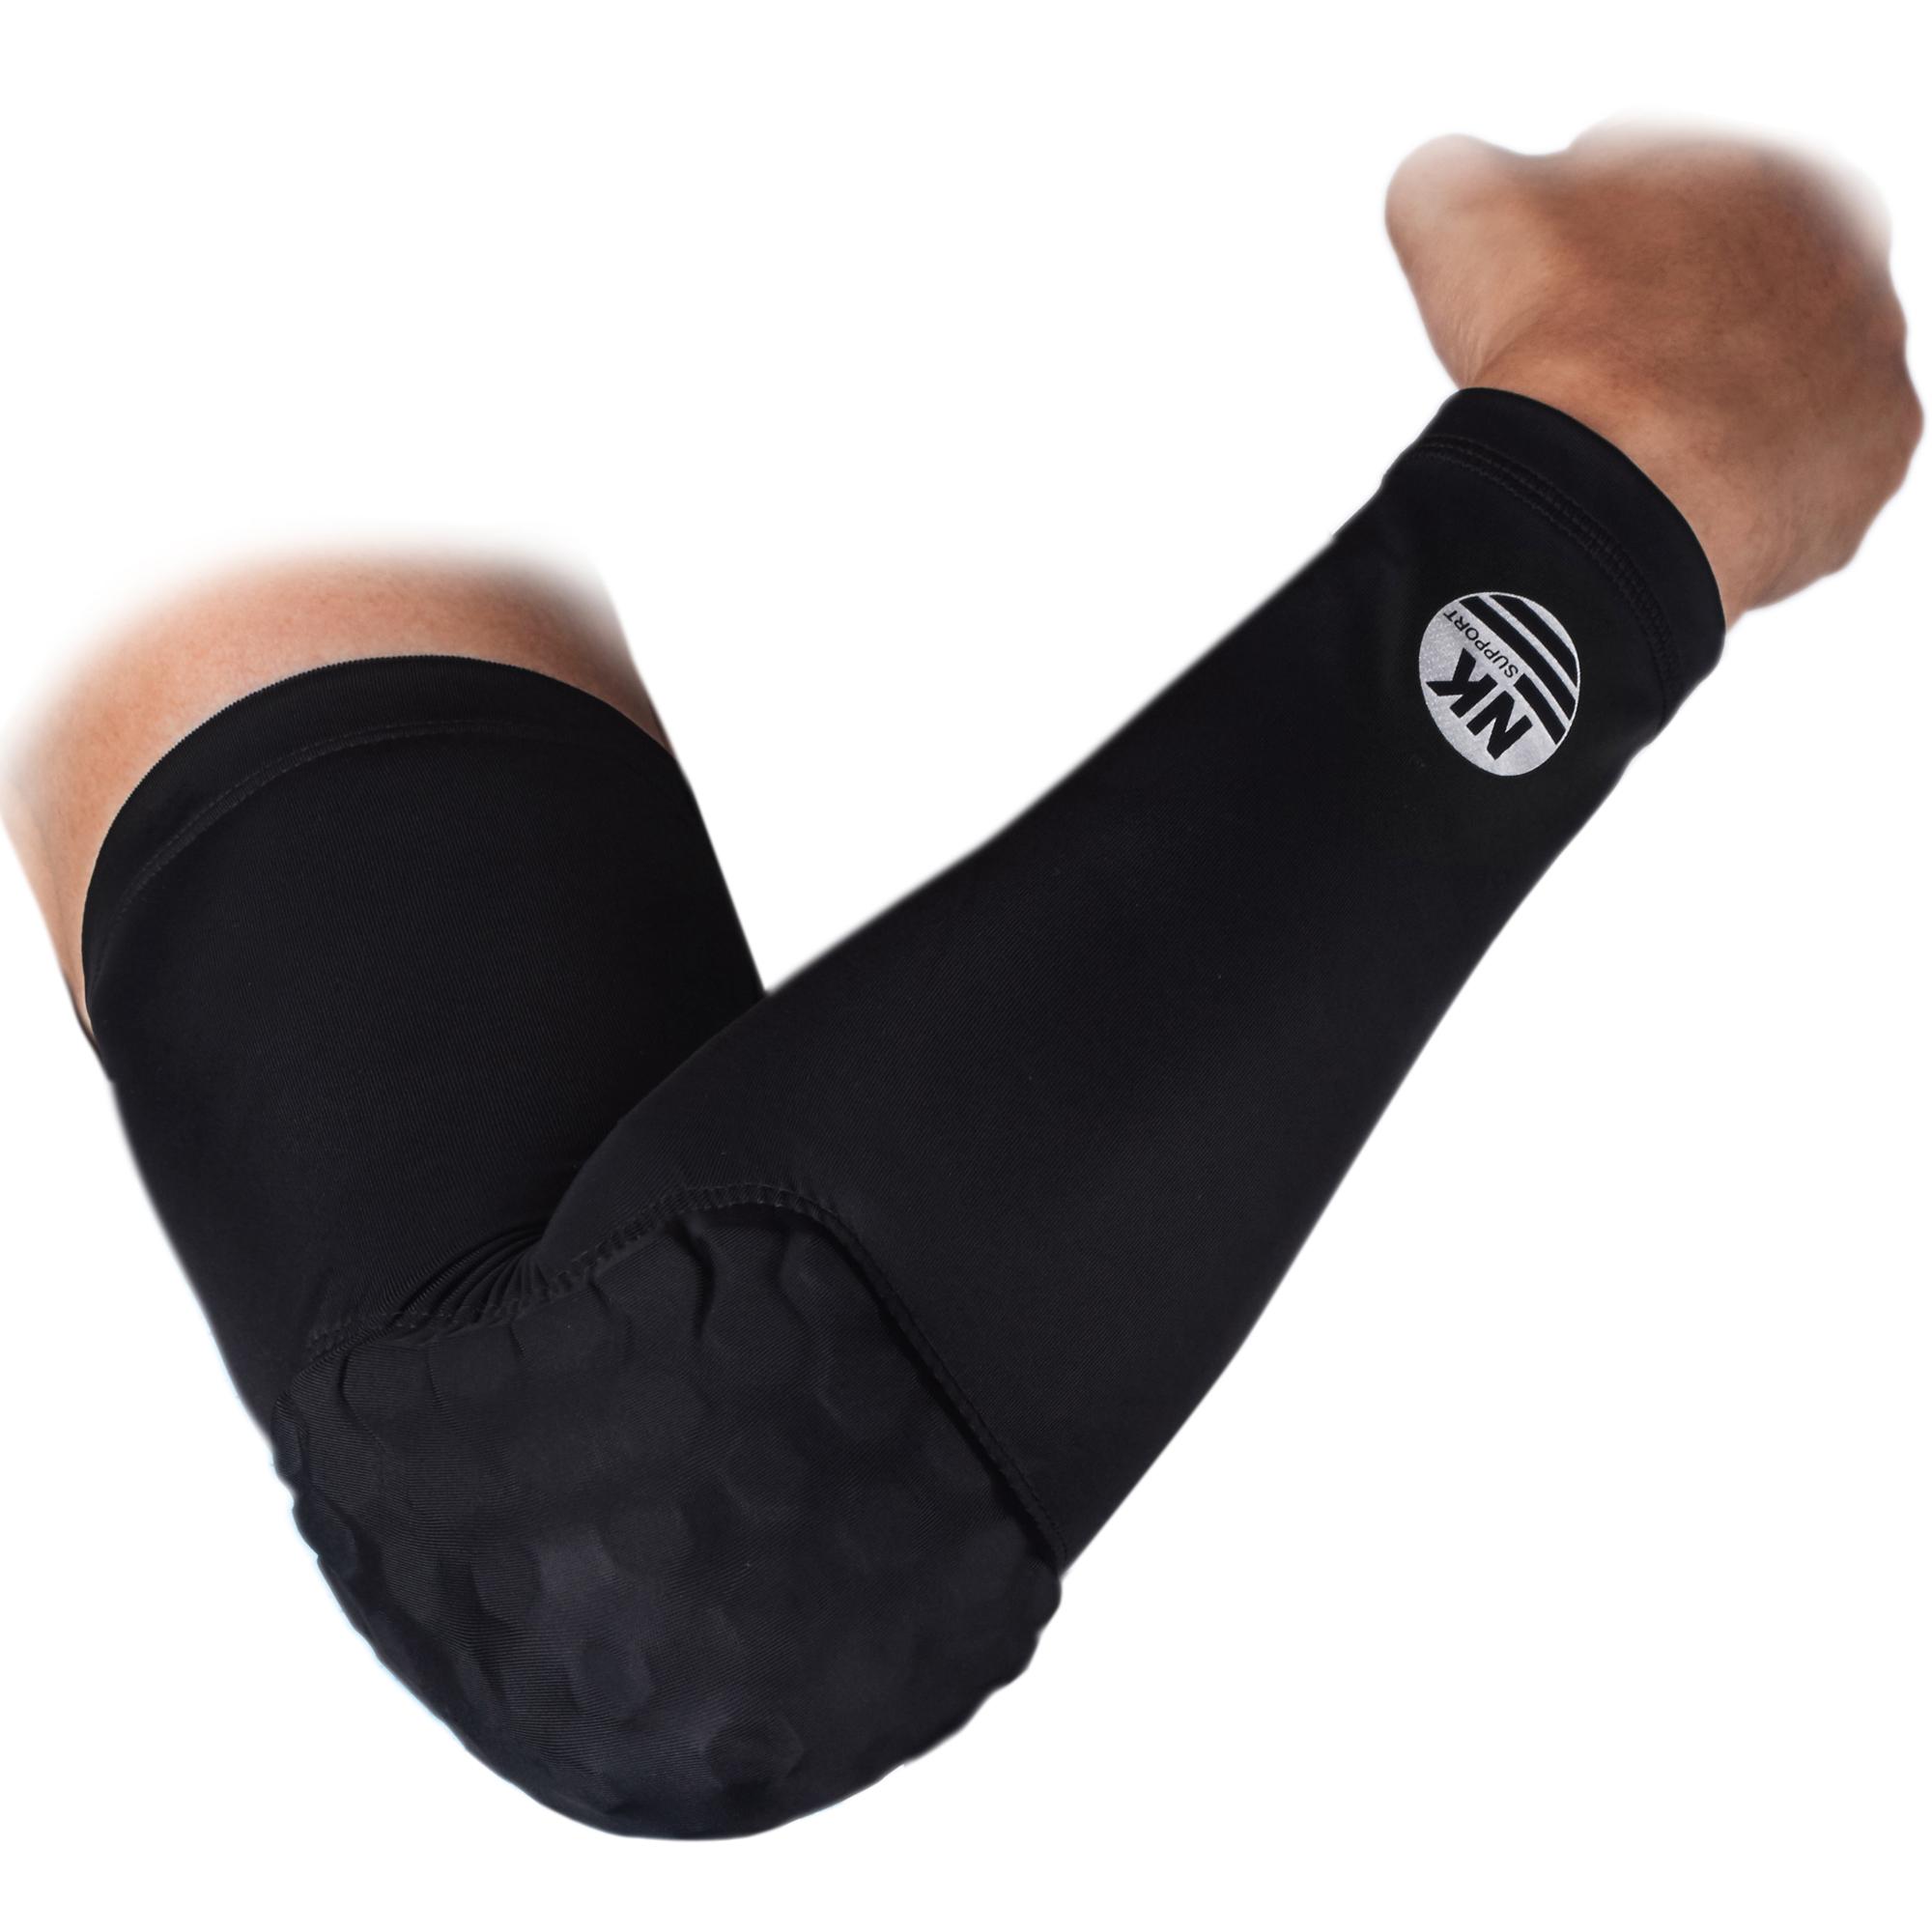 NK SUPPORT Elbow Pad Protector Gear Basketball Volleyball Cycling Shooting Honeycomb Crashproof Long Sleeve Single Black